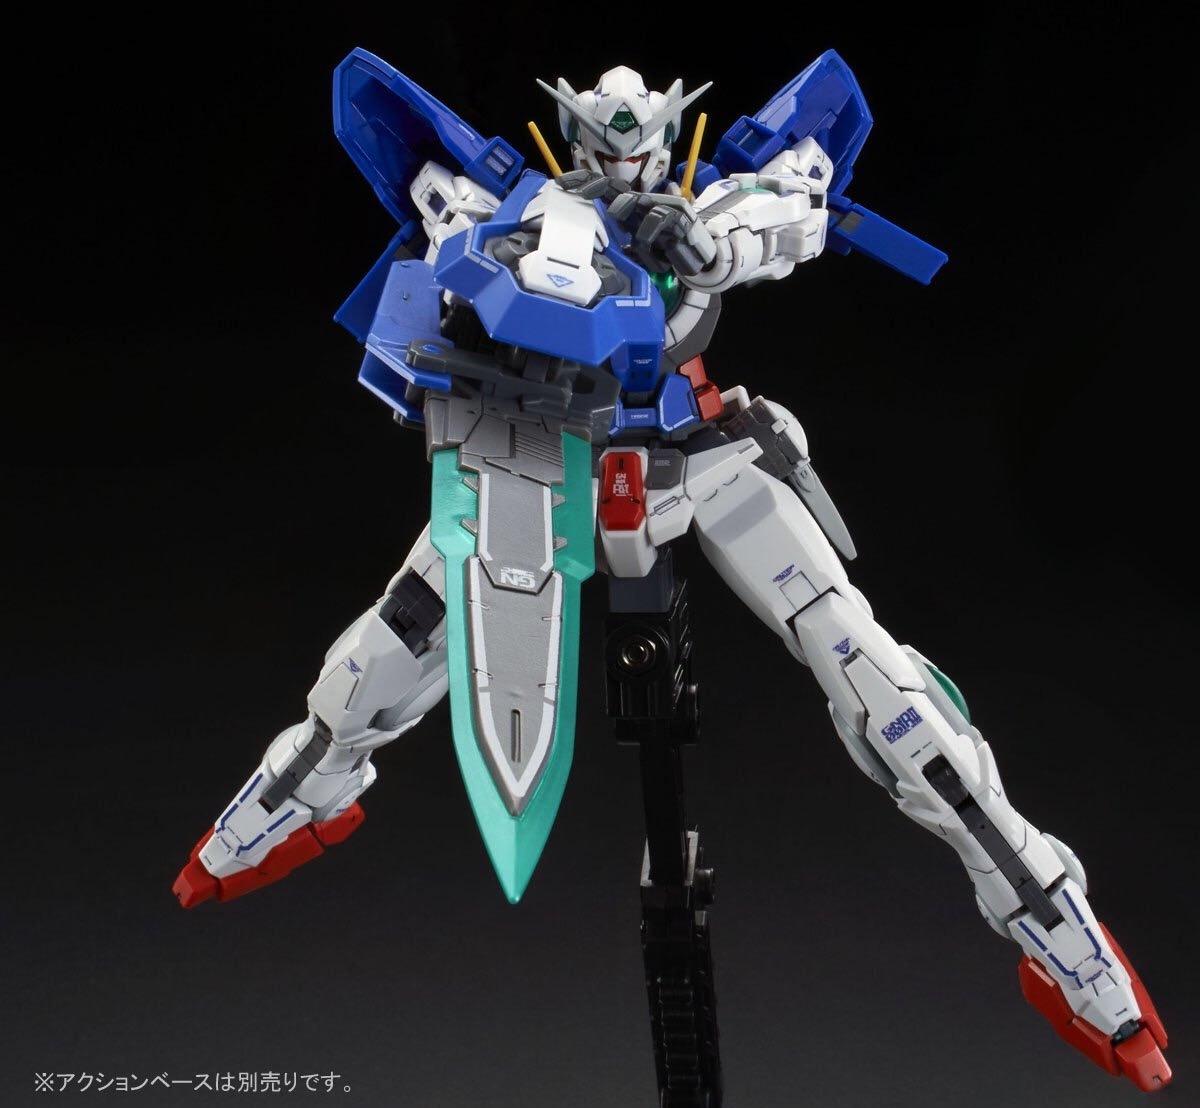 GUNDAM GUY: MG 1/100 Gundam Exia Avalanche Dash - Custom Build  |Gundam Exia